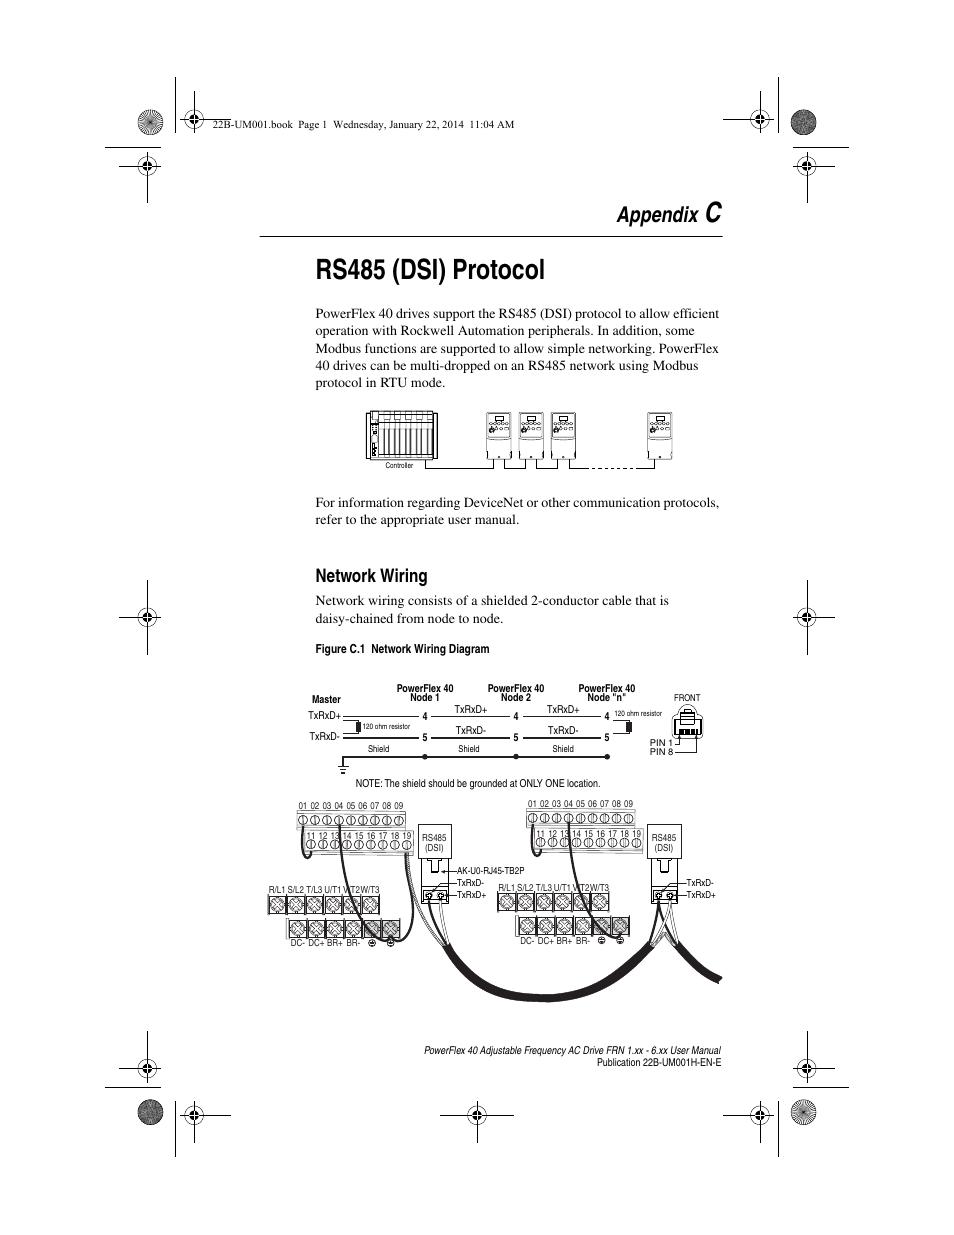 daisy chain wiring diagram 9 pin trailer plug appendix c rs485 dsi protocol network rockwell automation 22b powerflex 40 frn 1 xx 6 user manual page 125 160